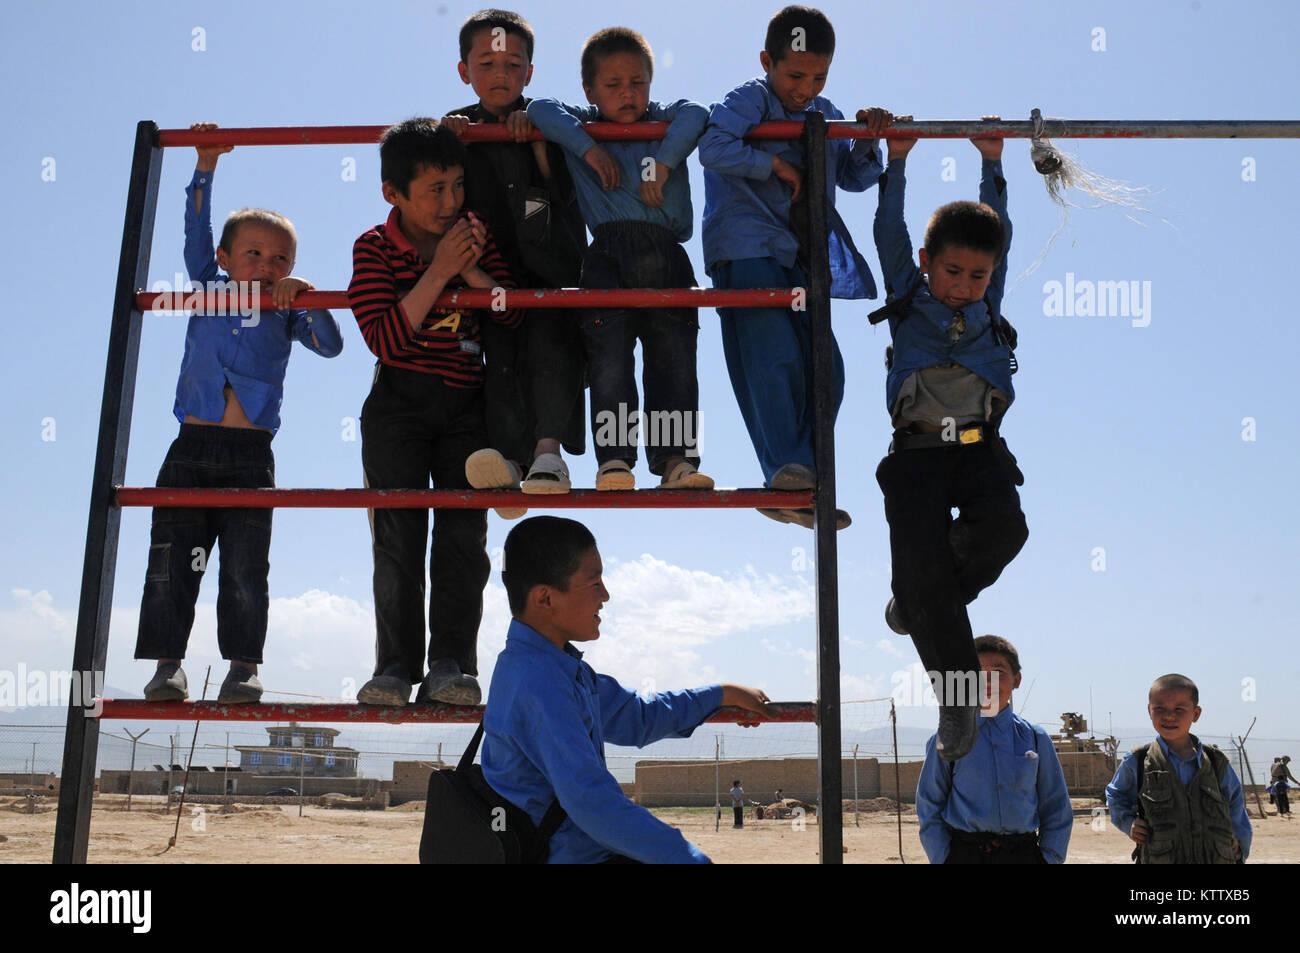 Young Afghan schoolboys play on the Aliabad School's jungle gym near Mazar-e-Sharif, Balkh Province, Afghanistan, - Stock Image